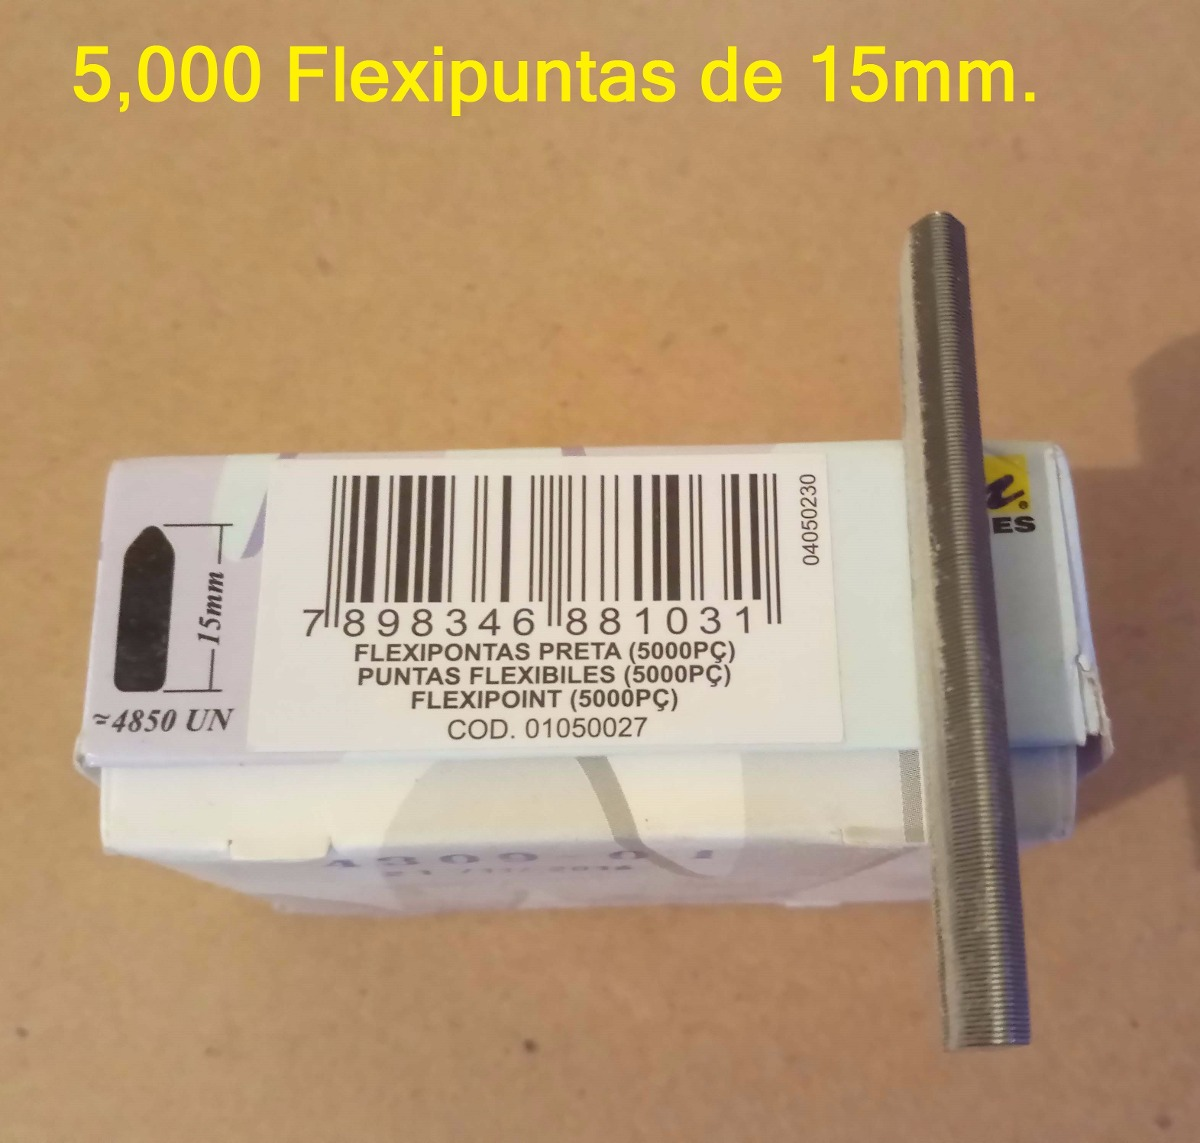 5,000 Flexipuntas, Grapas Flexibles, Inmes, Logan. - $ 649.00 en ...